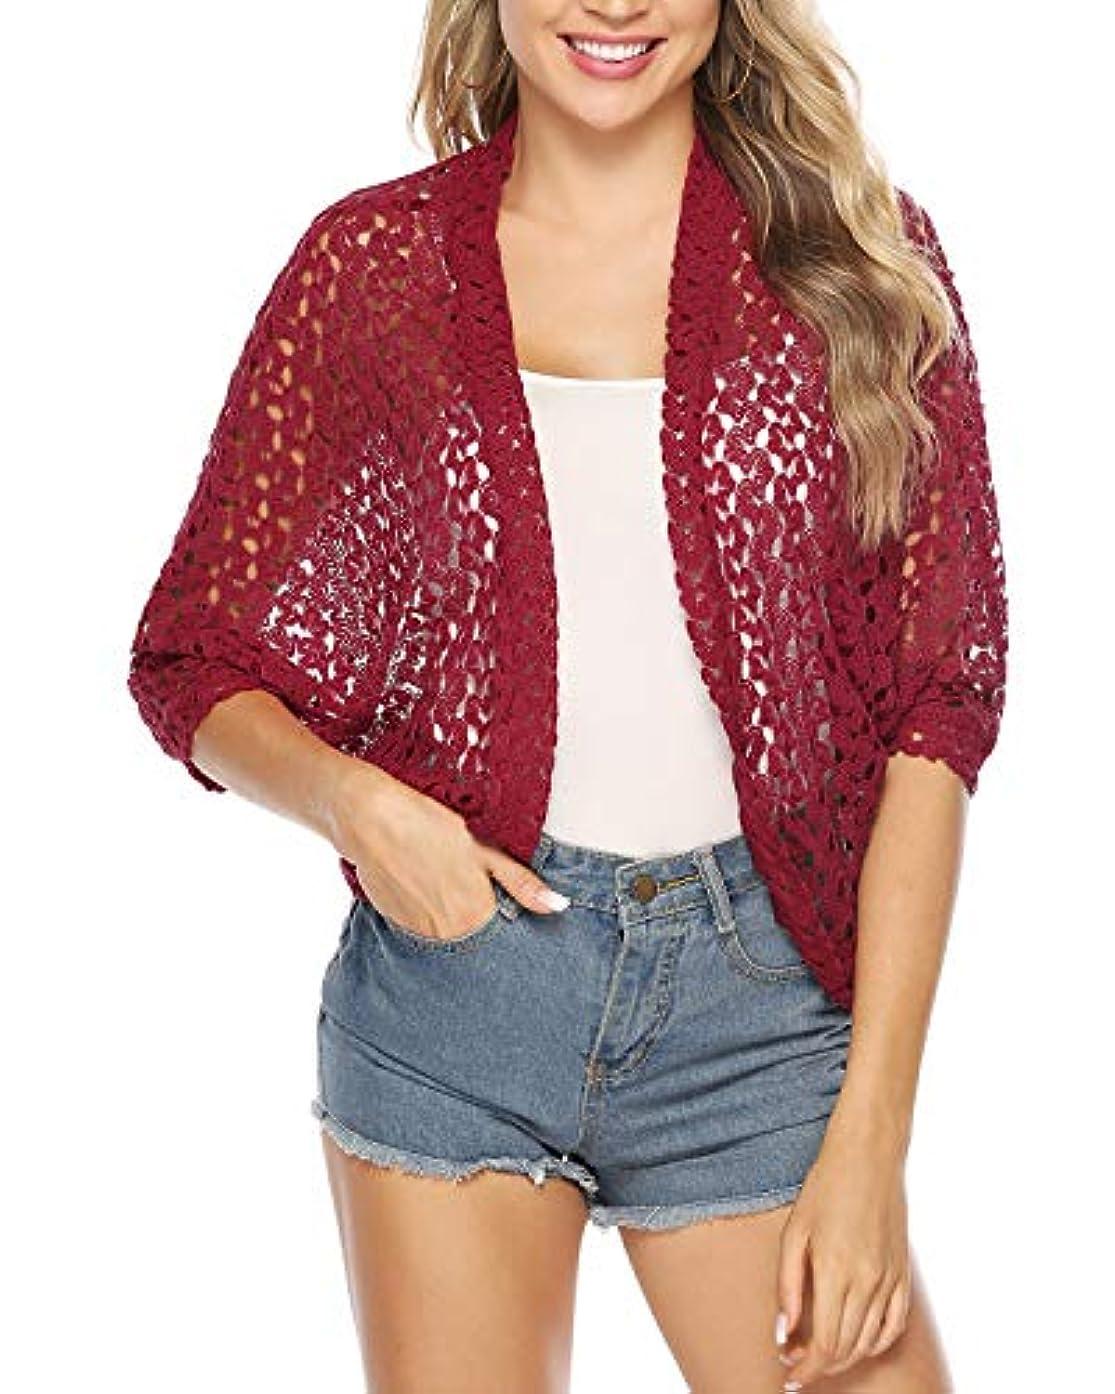 Hawiton Women's 3/4 Sleeve Shrug Lace Crochet Open Front Cardigan Bolero Jackets